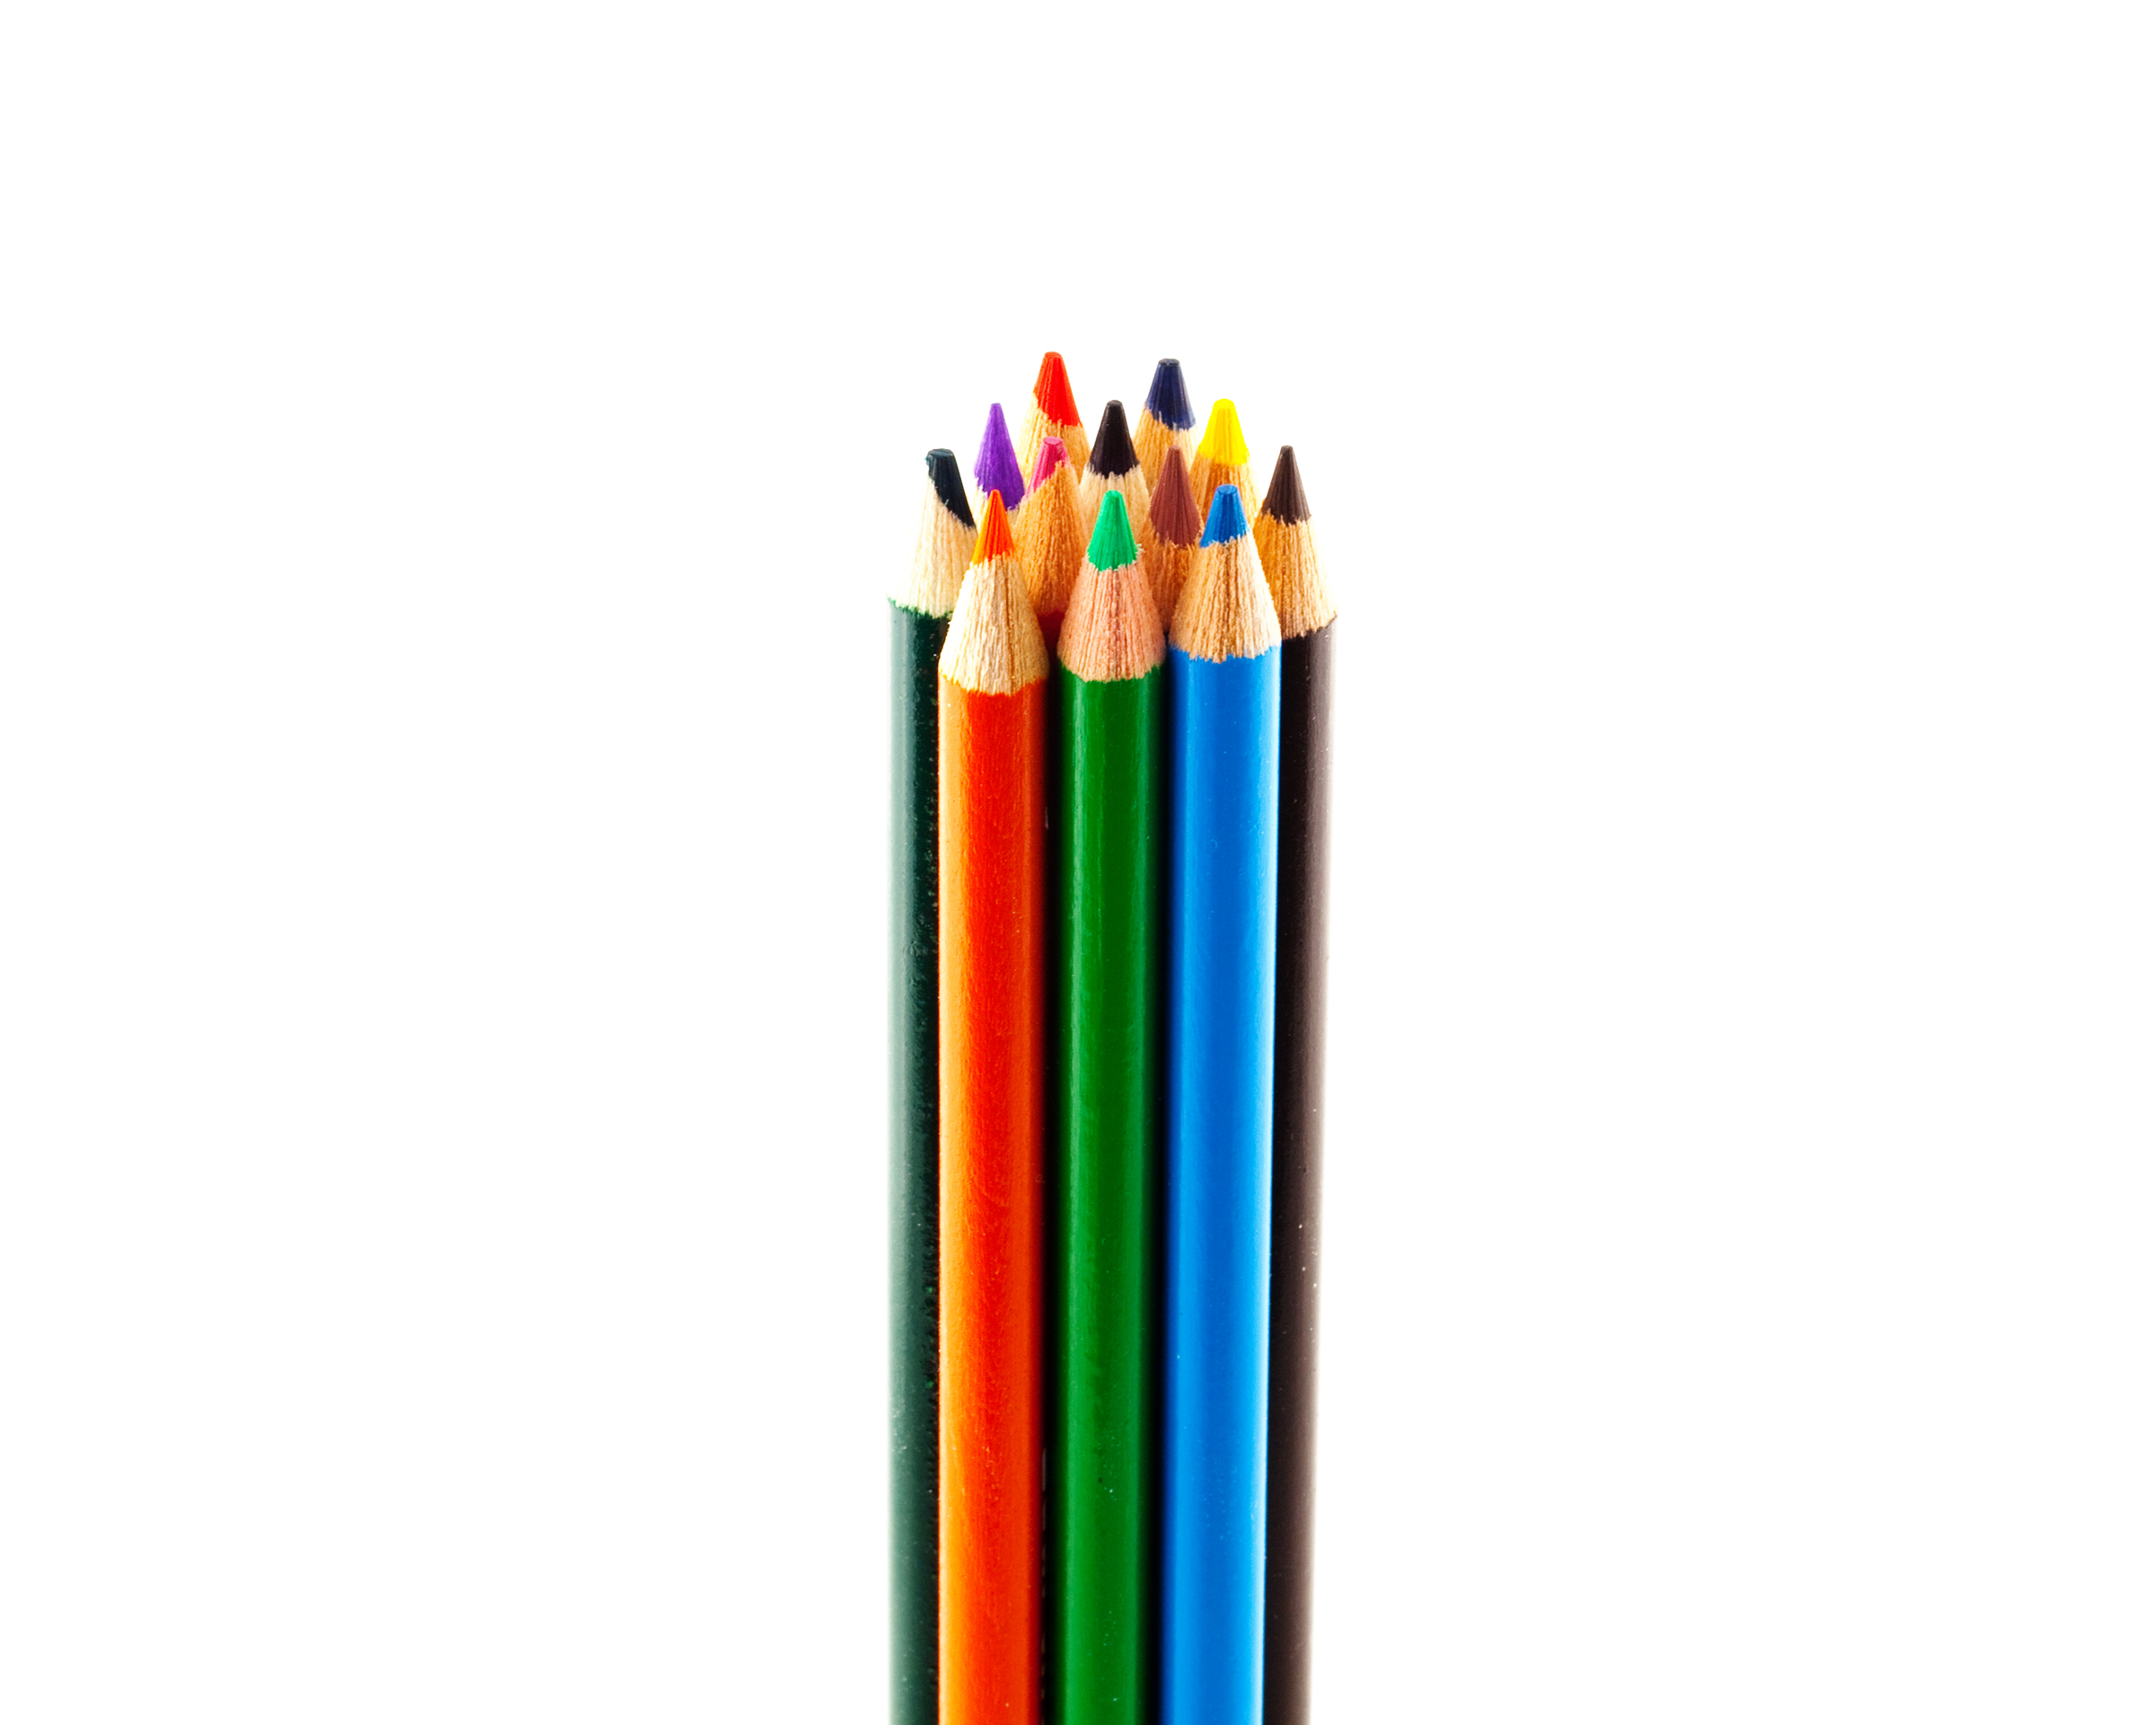 Colored pencils, Art, Wood, White, Sketch, HQ Photo